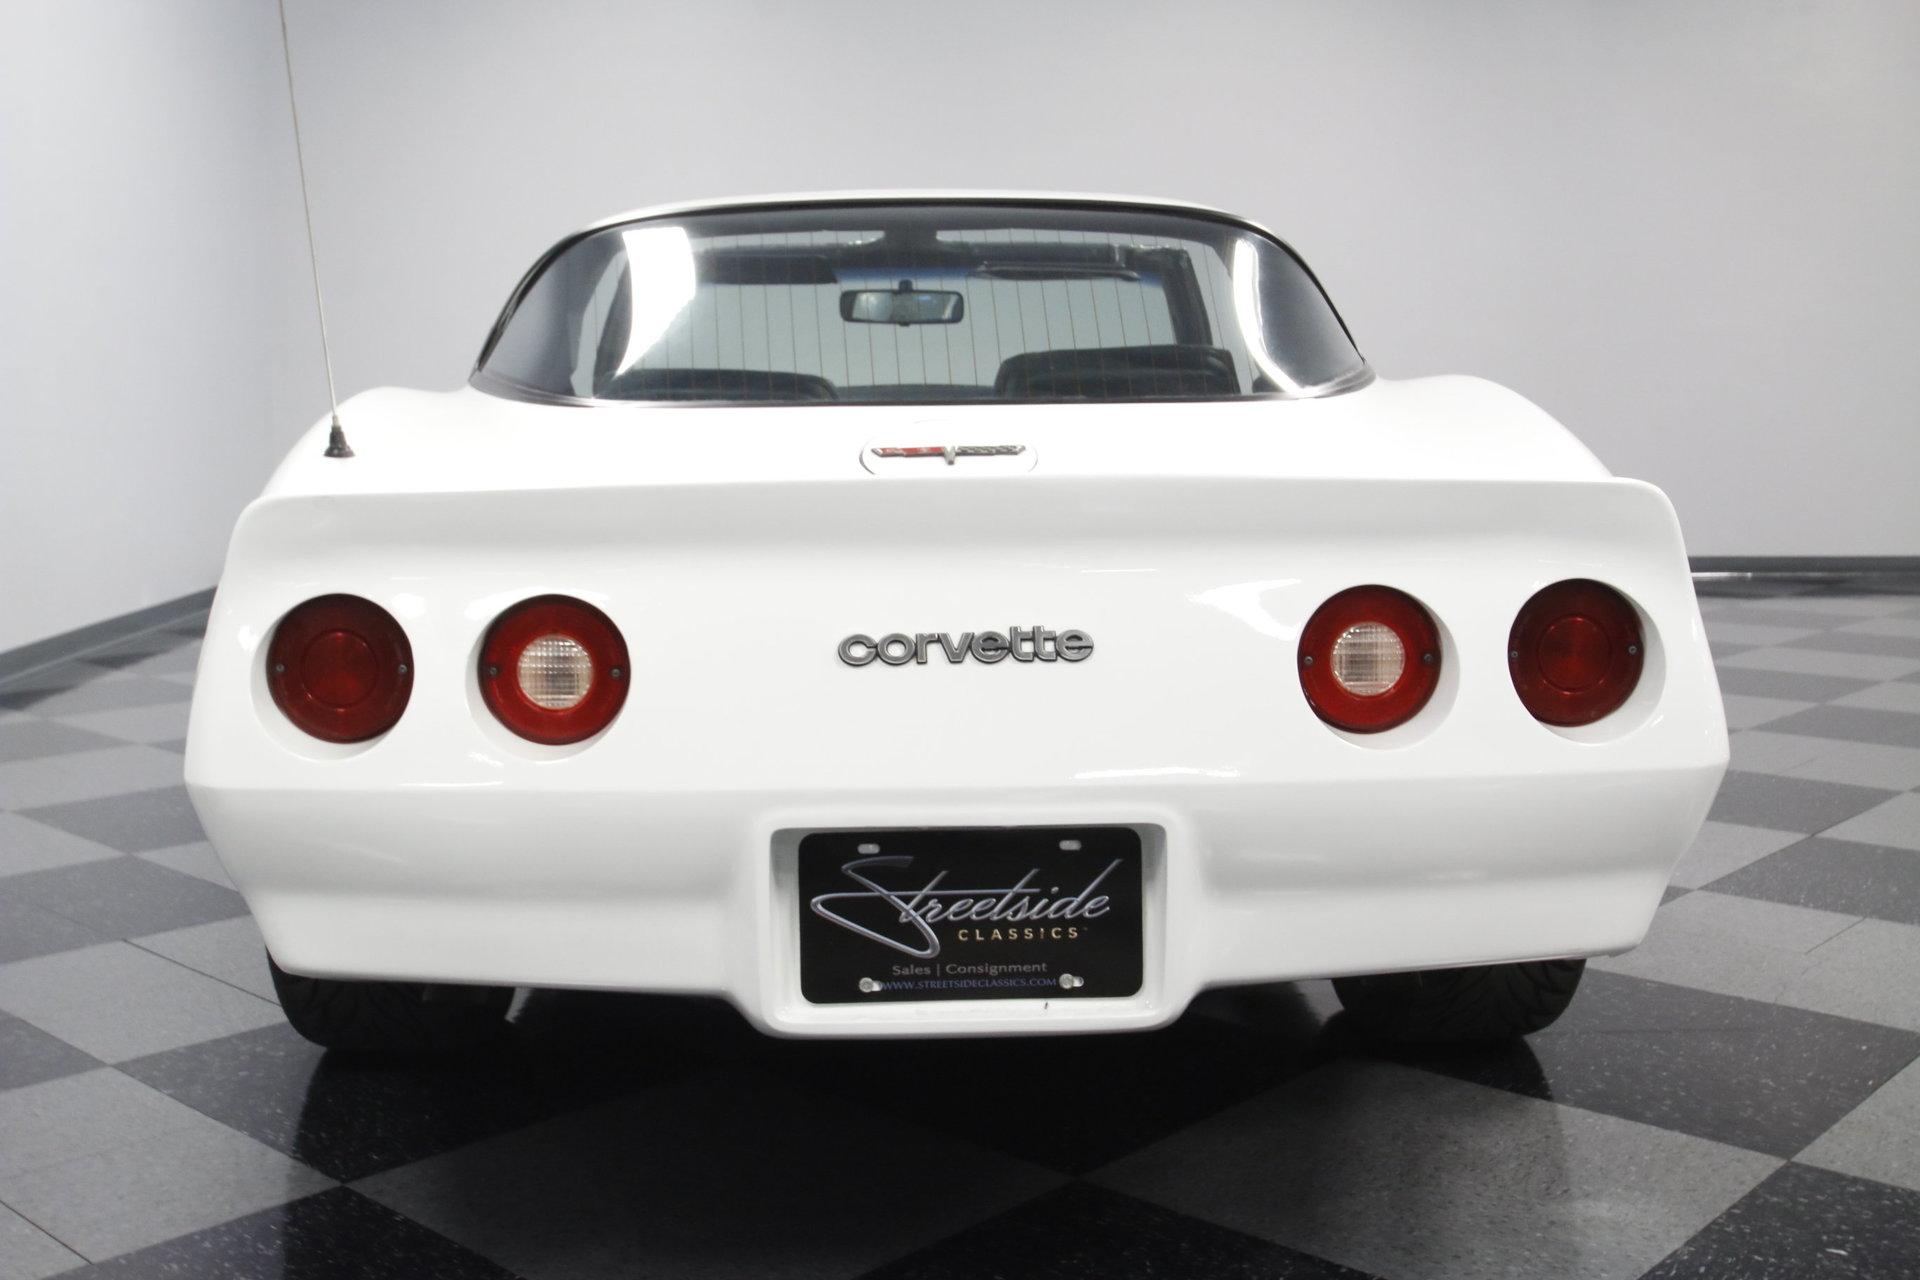 1981 Chevrolet Corvette | My Classic Garage